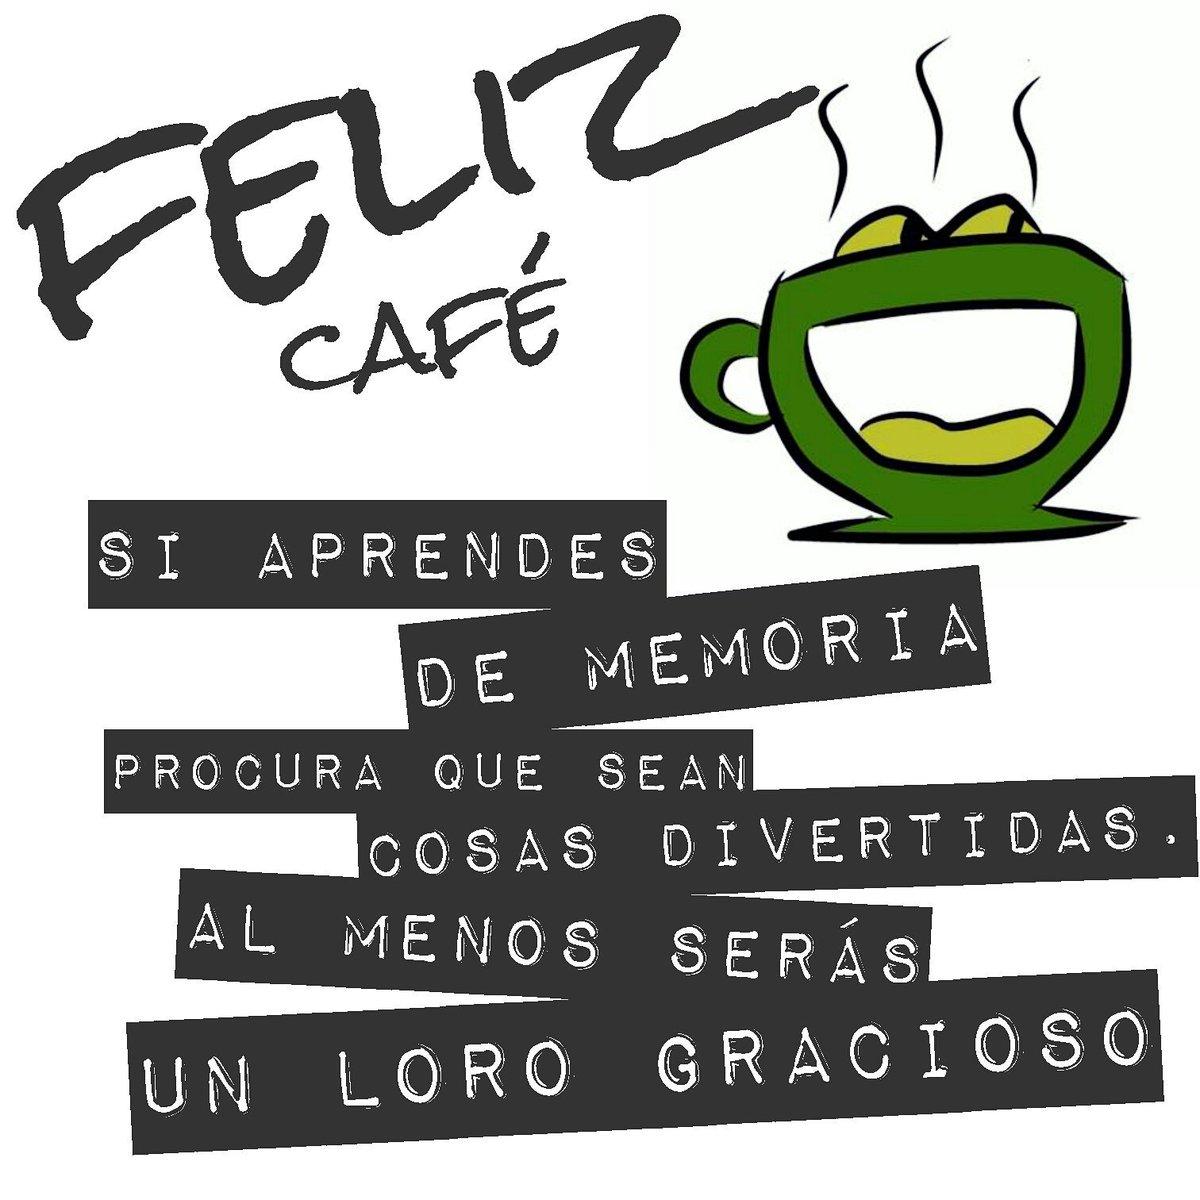 El Cafe Parlante On Twitter Buenos Dias Cafeteros Y Parlantes Https T Co Dtidmzosjl